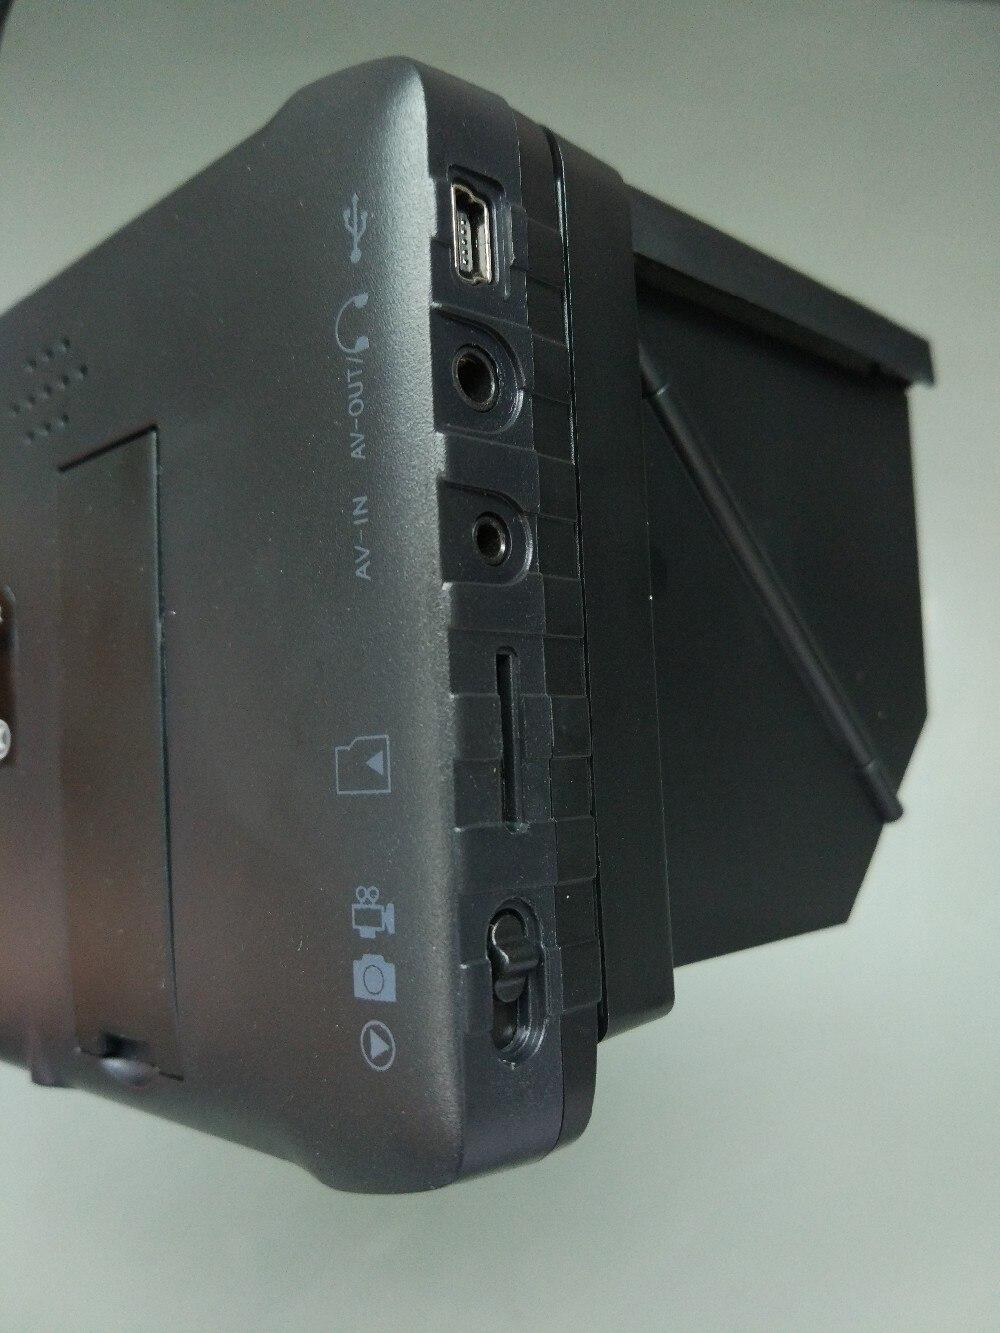 5x 2.4GHz WLAN WiFi Antenna for Wireless Surveillance Monitor Receiver IP Camera